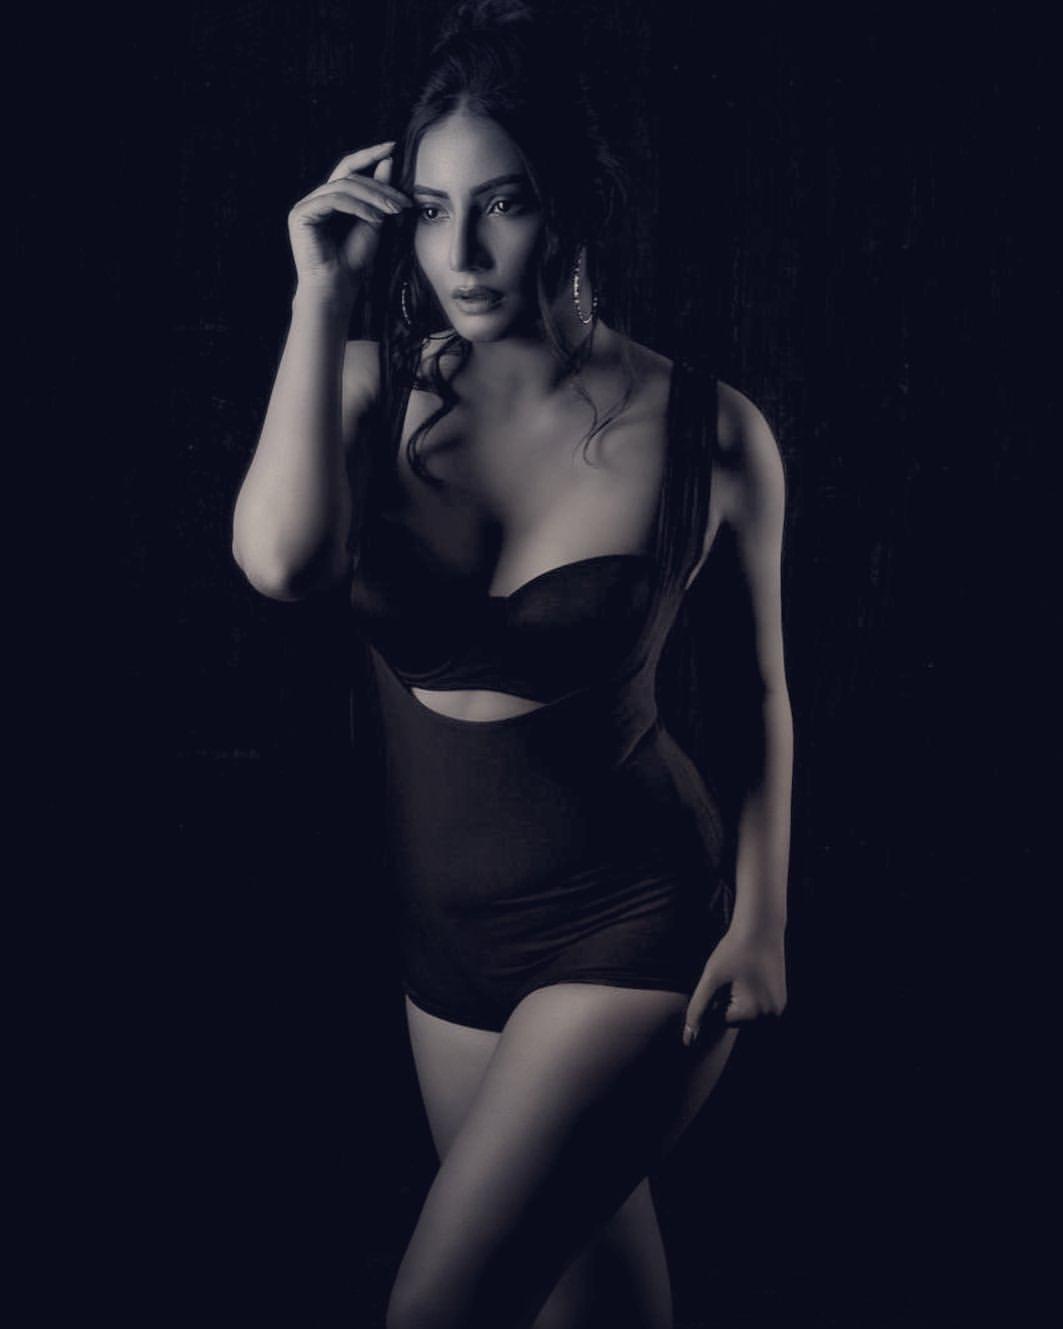 Instagram model Teena Shanell Hot photos Navel Queens